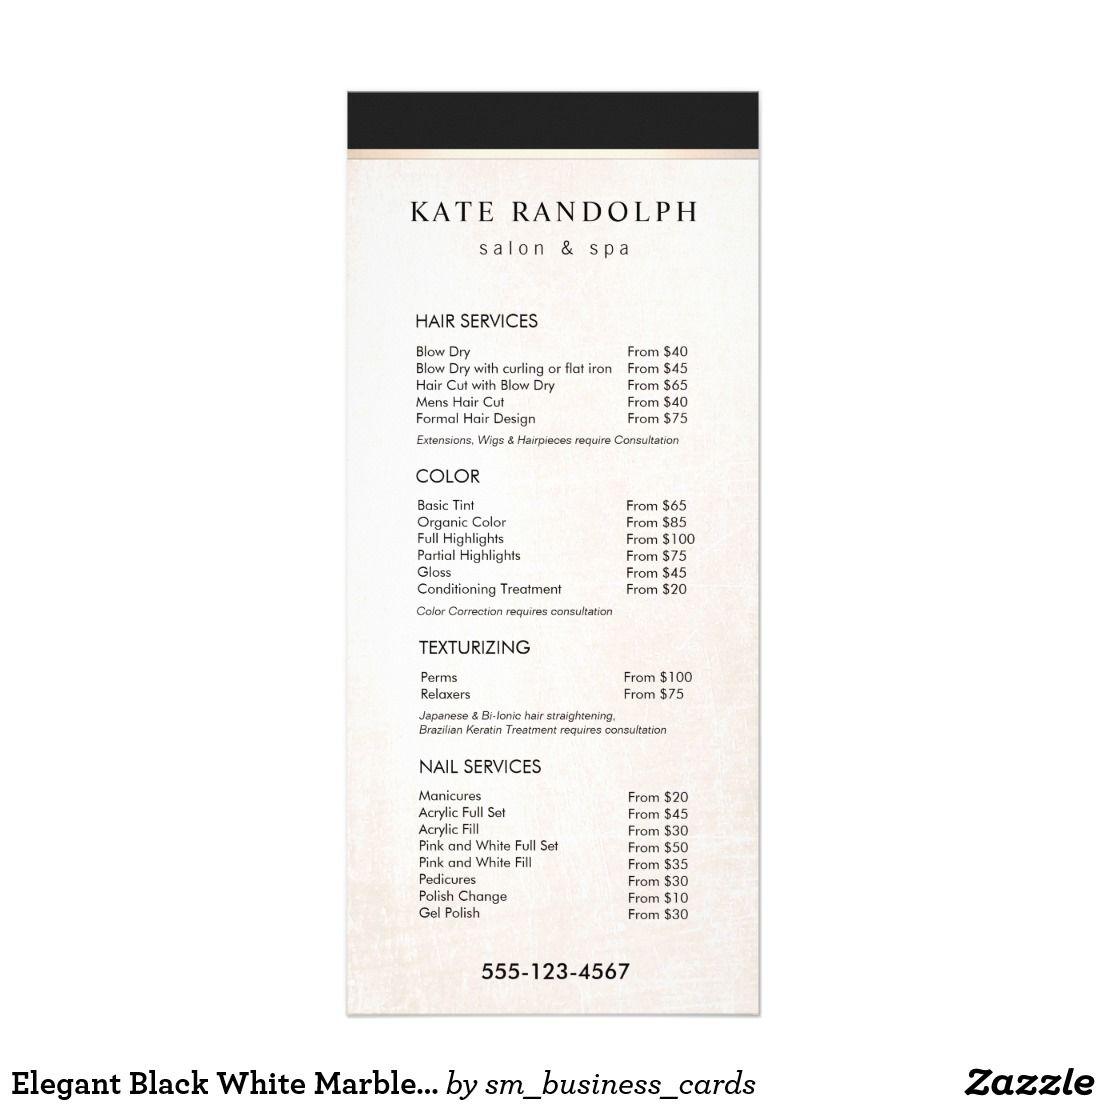 Wedding Hairstyle Price List: Elegant Black White Marble Salon Price List Menu